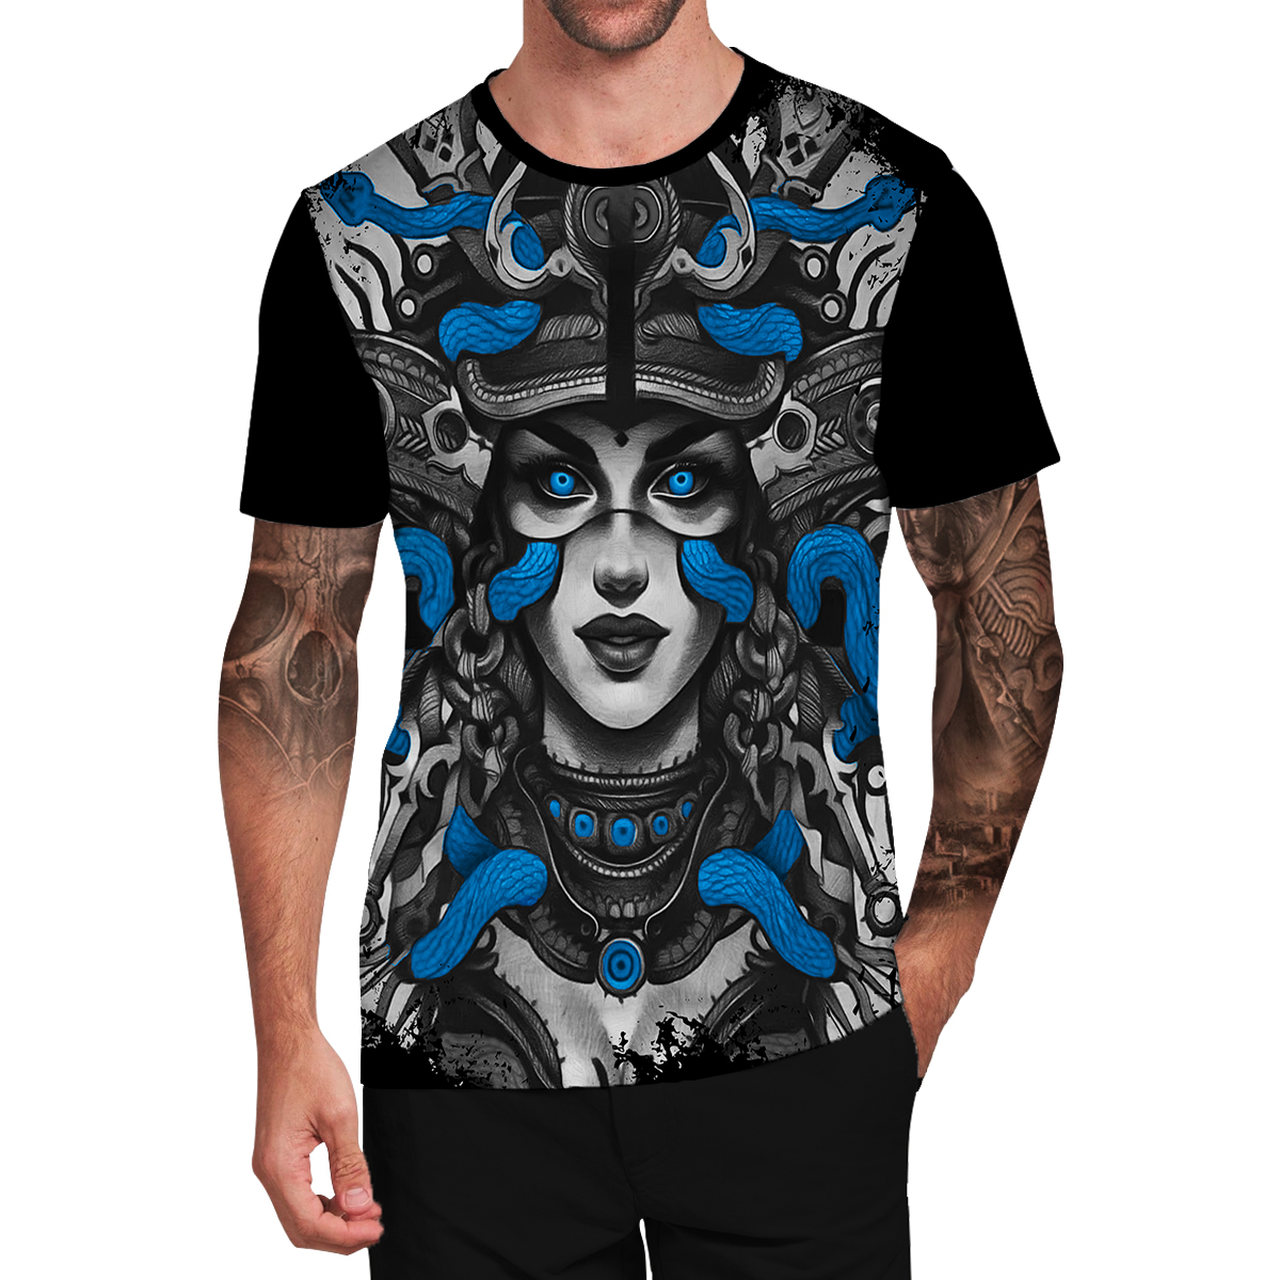 Stompy Camiseta Tattoo Tatuagem Caveira Skull 89